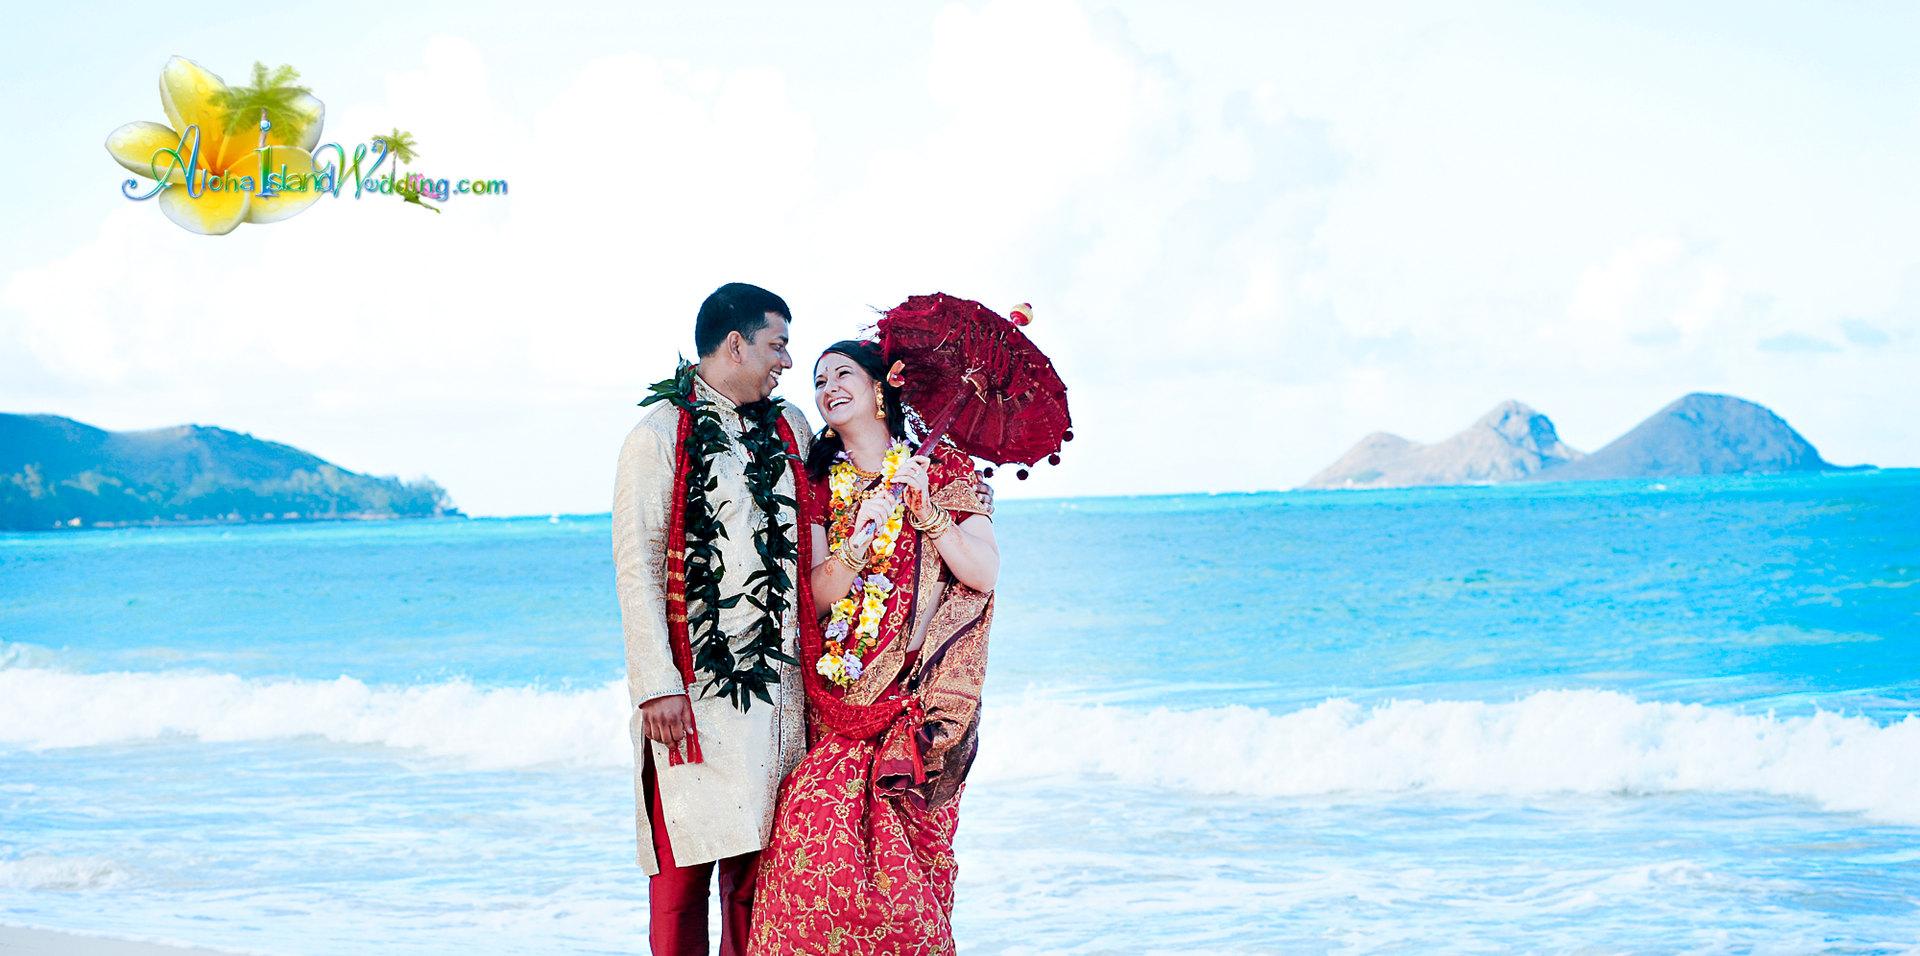 Indian wedding ceremony in hawaii-243.jp